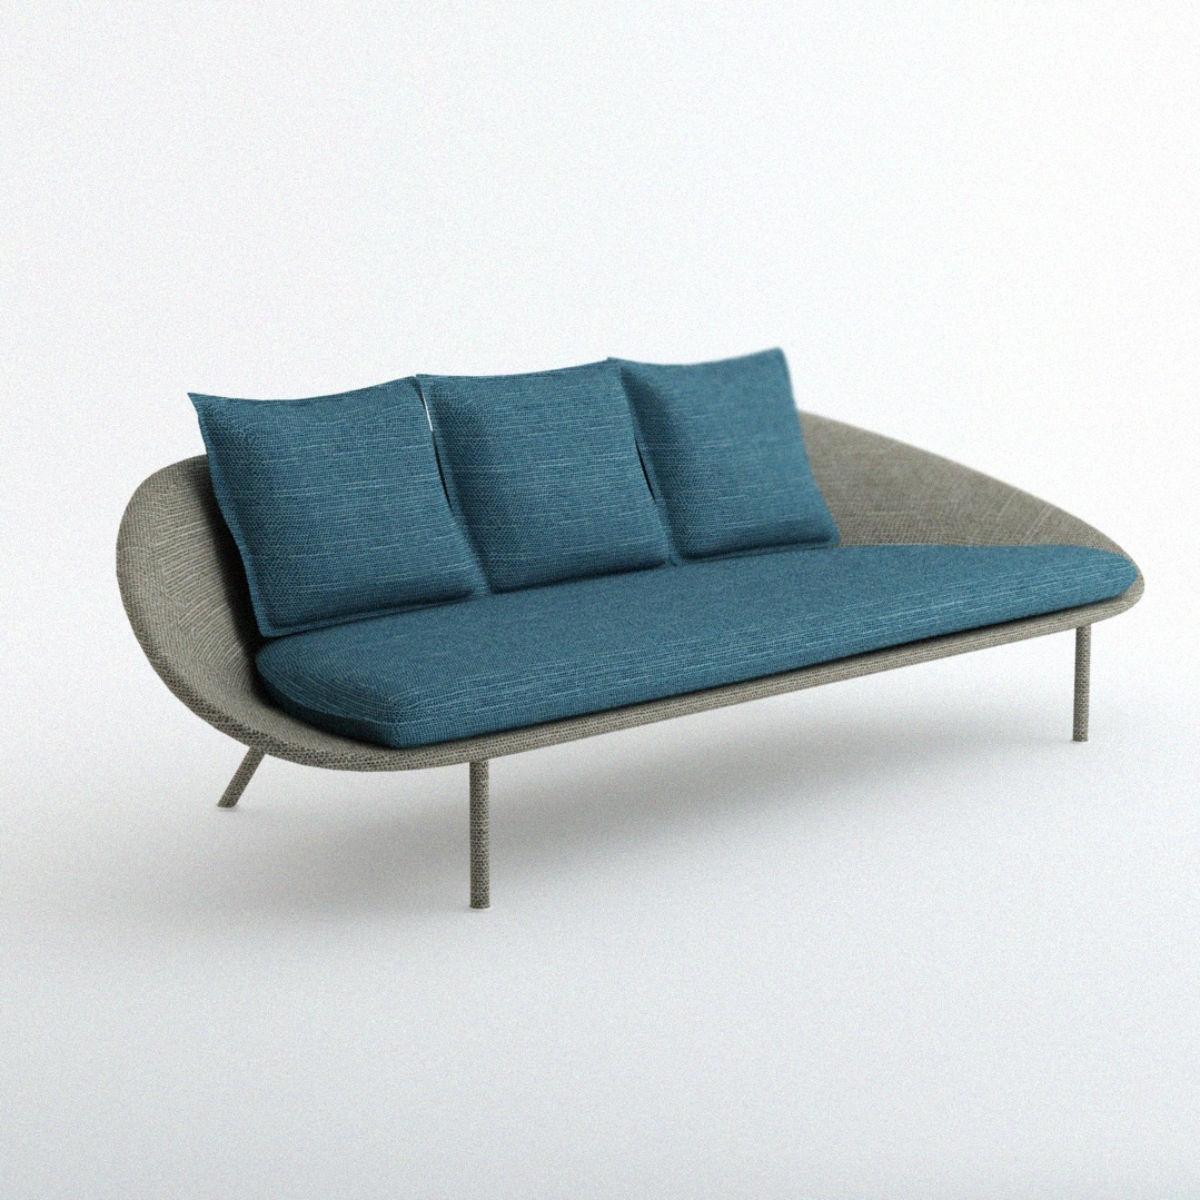 Divano lem 3 posti - Lunghezza divano 3 posti ...